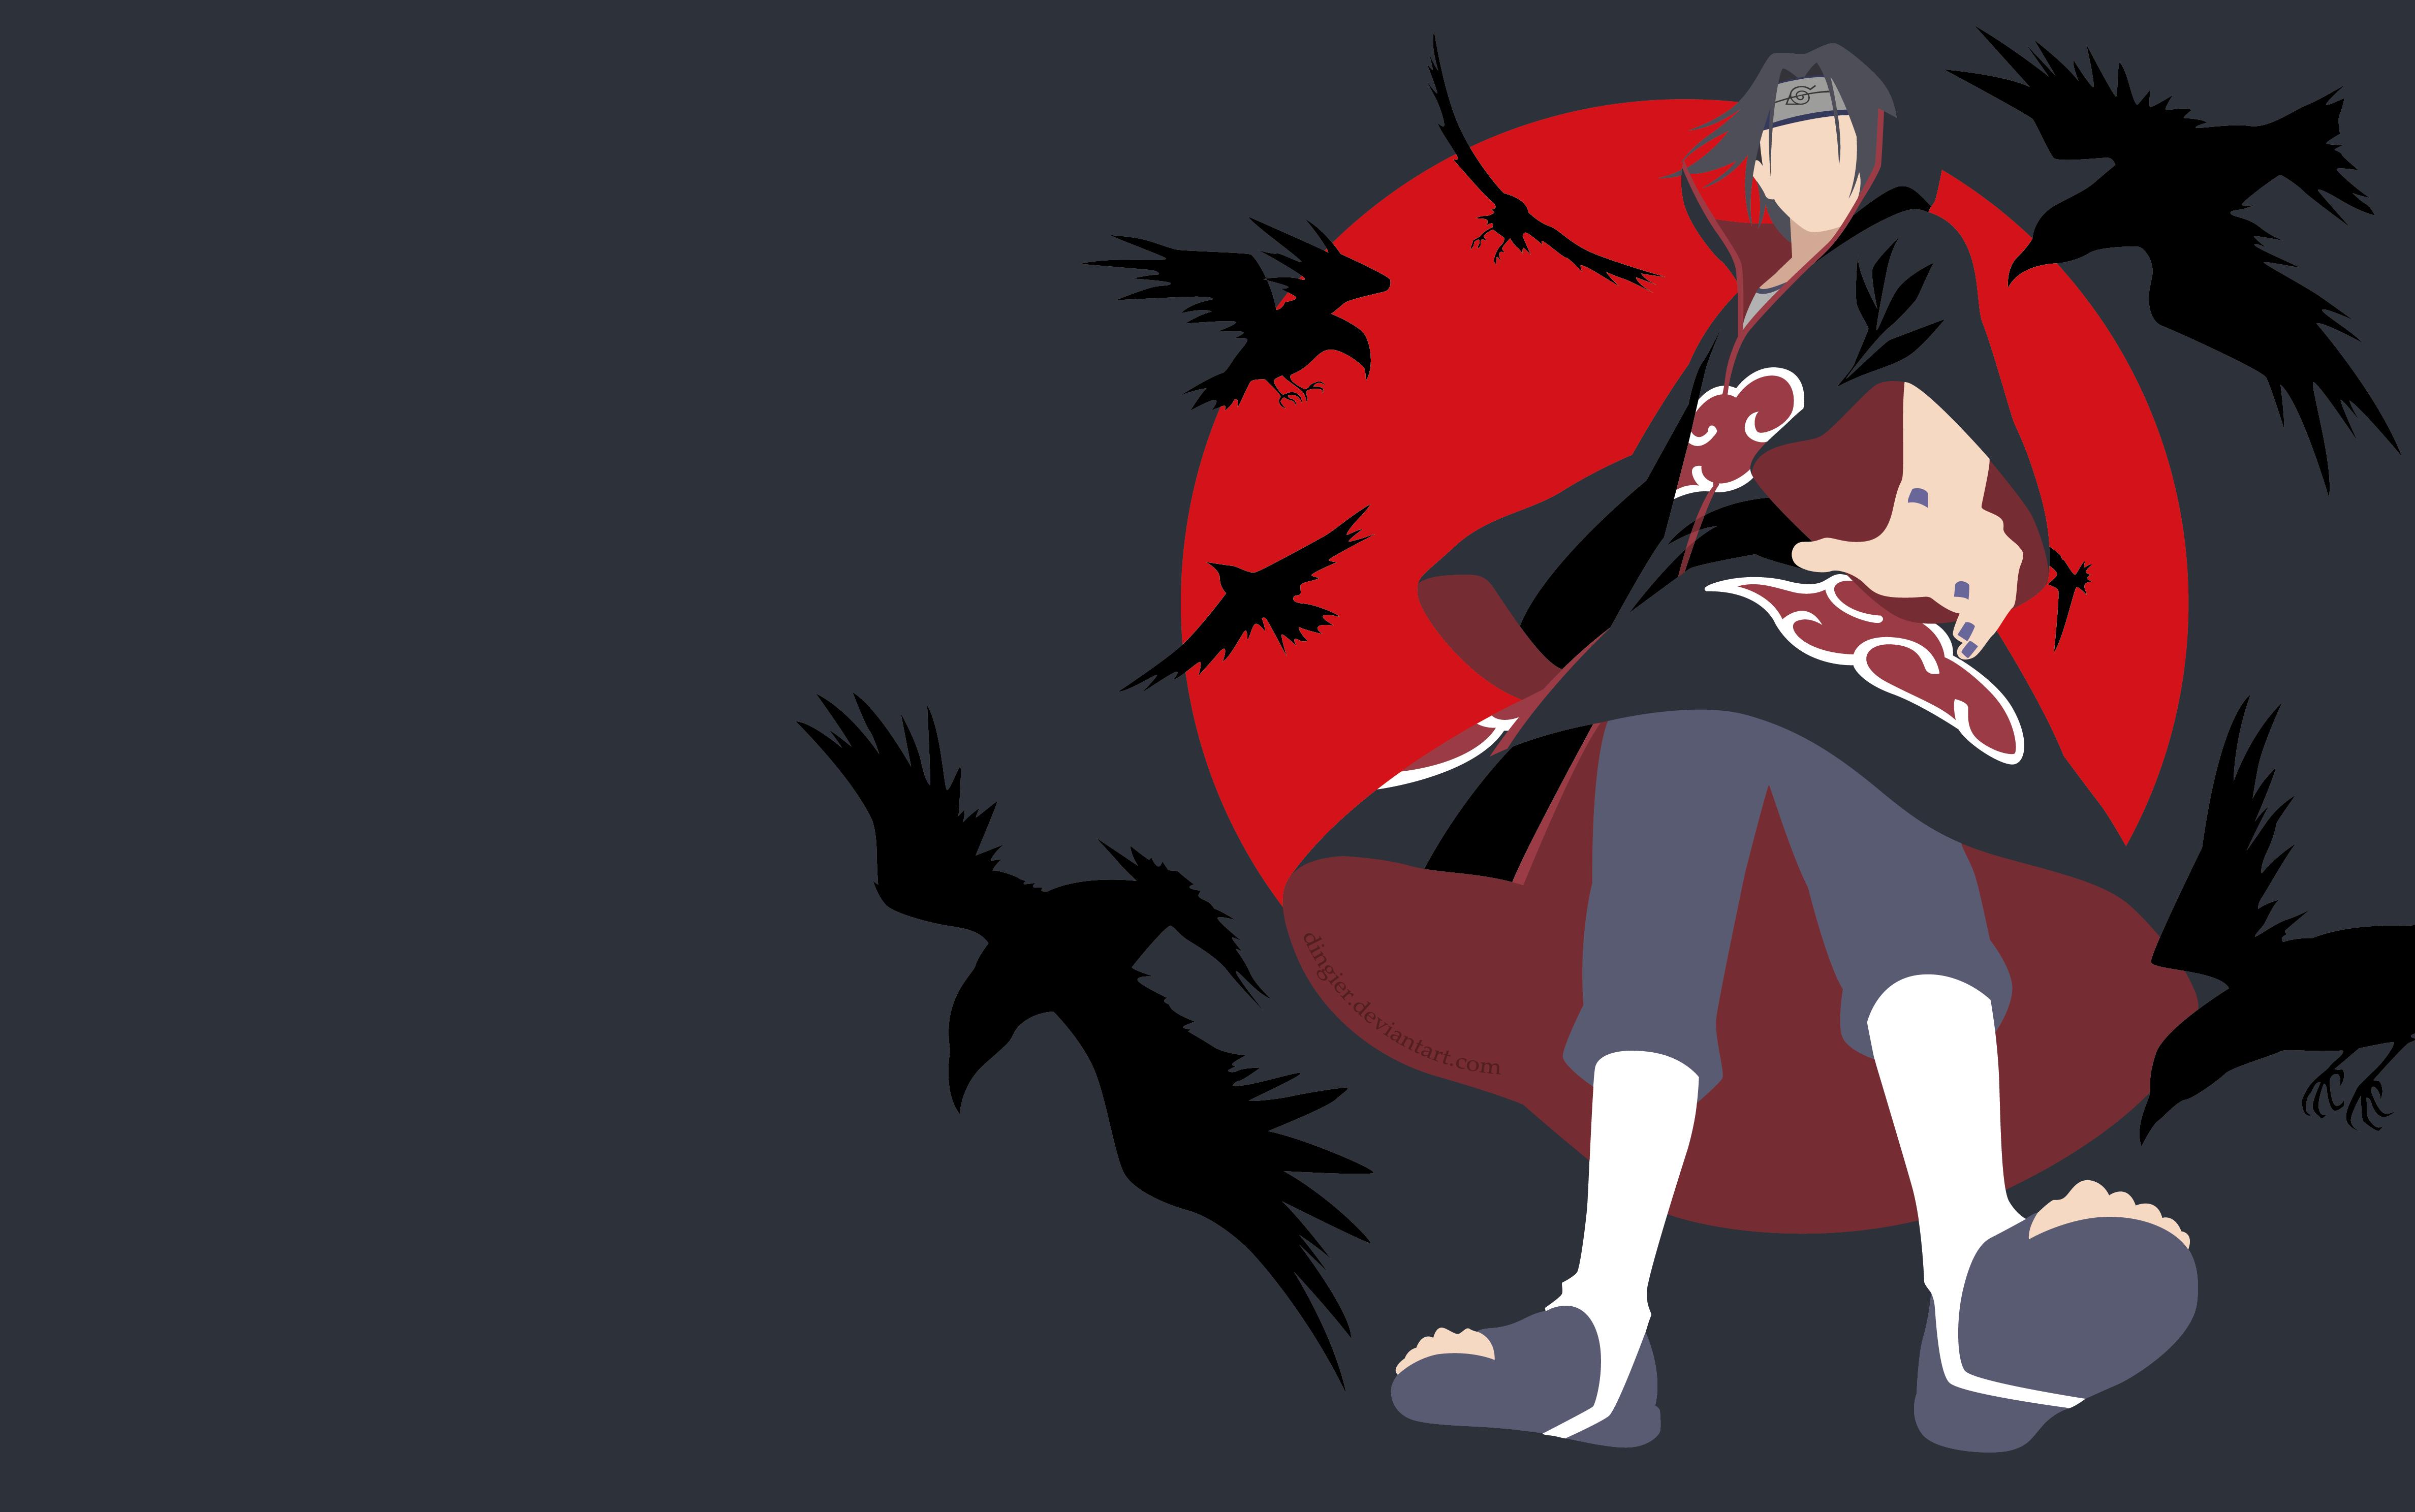 Naruto 4k Ultra Hd Wallpaper Background Image 4753x2976 Id 964708 Wallpaper Abyss